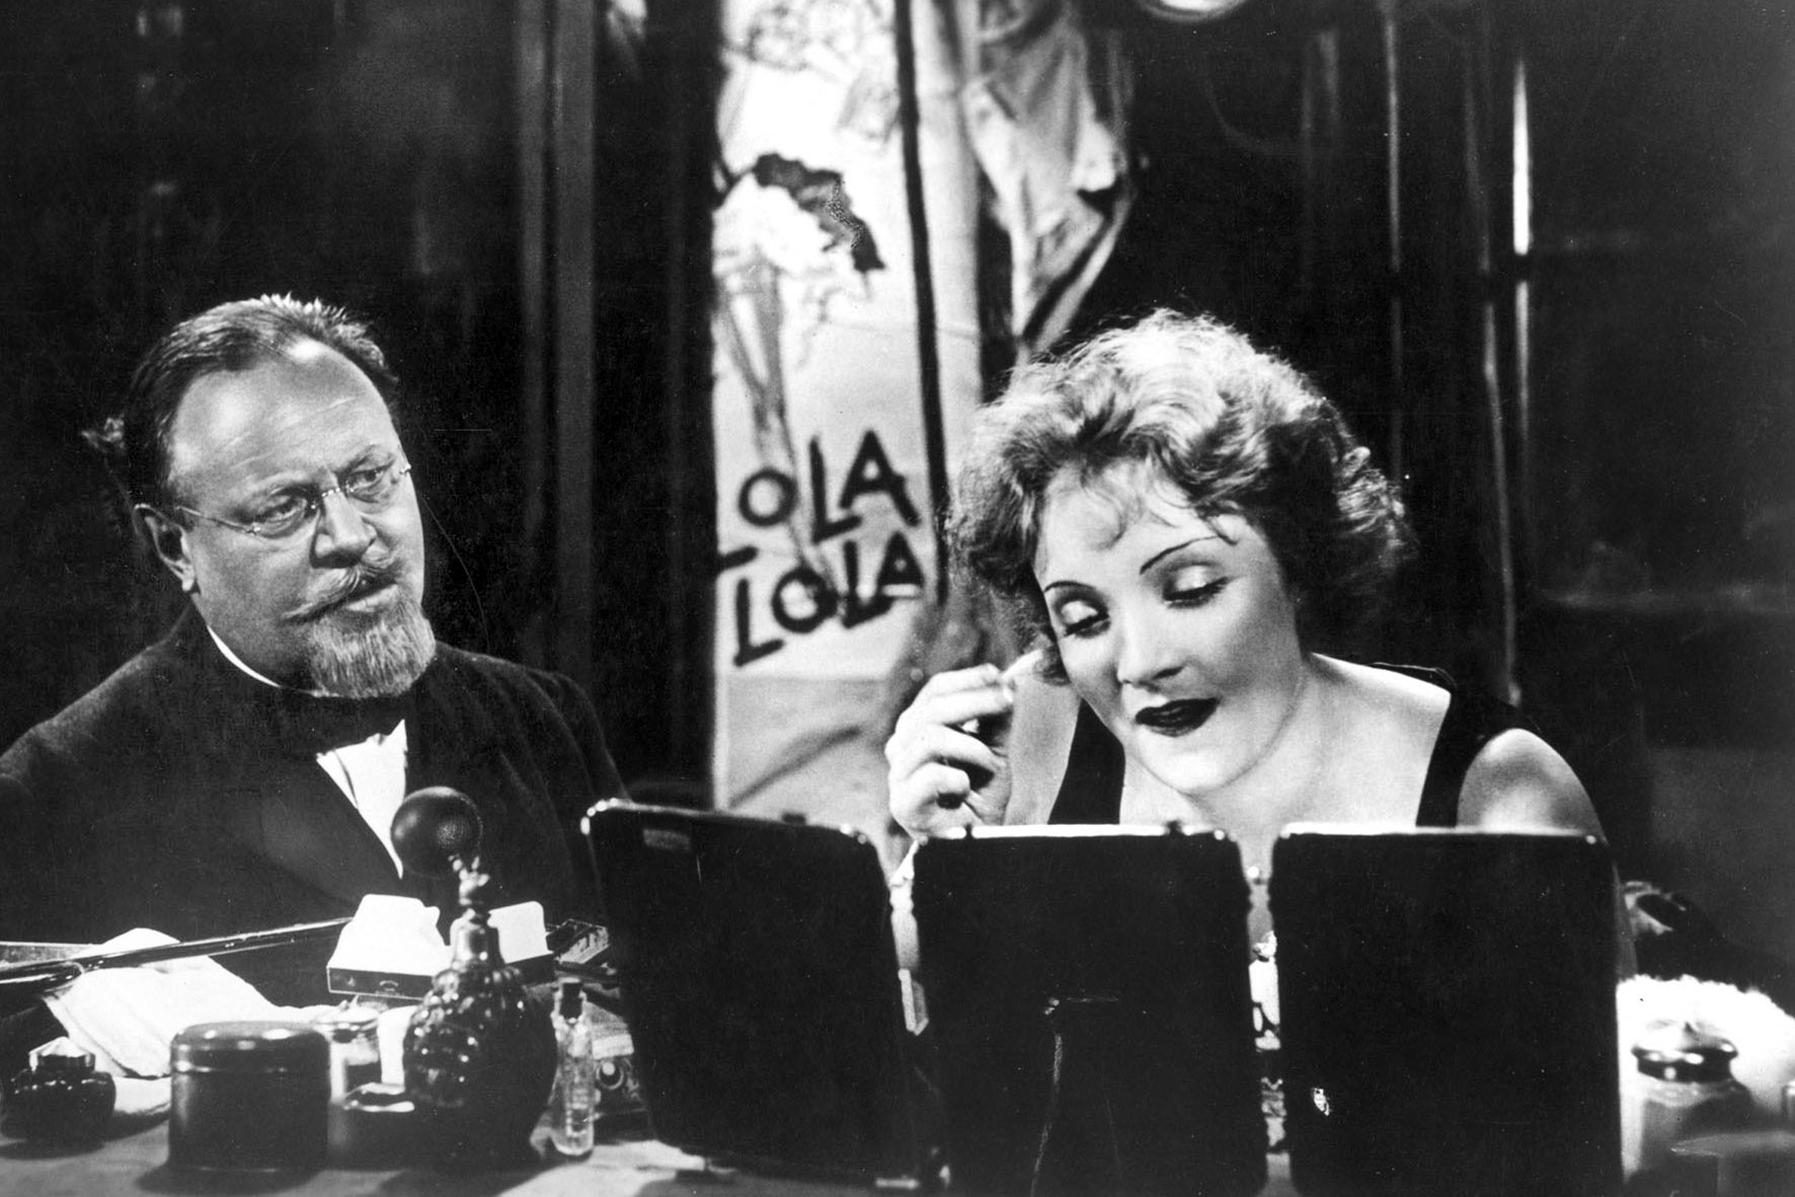 Emil Jannings et Marlene Dietrich dans L'Ange bleu de Josef von Sternberg